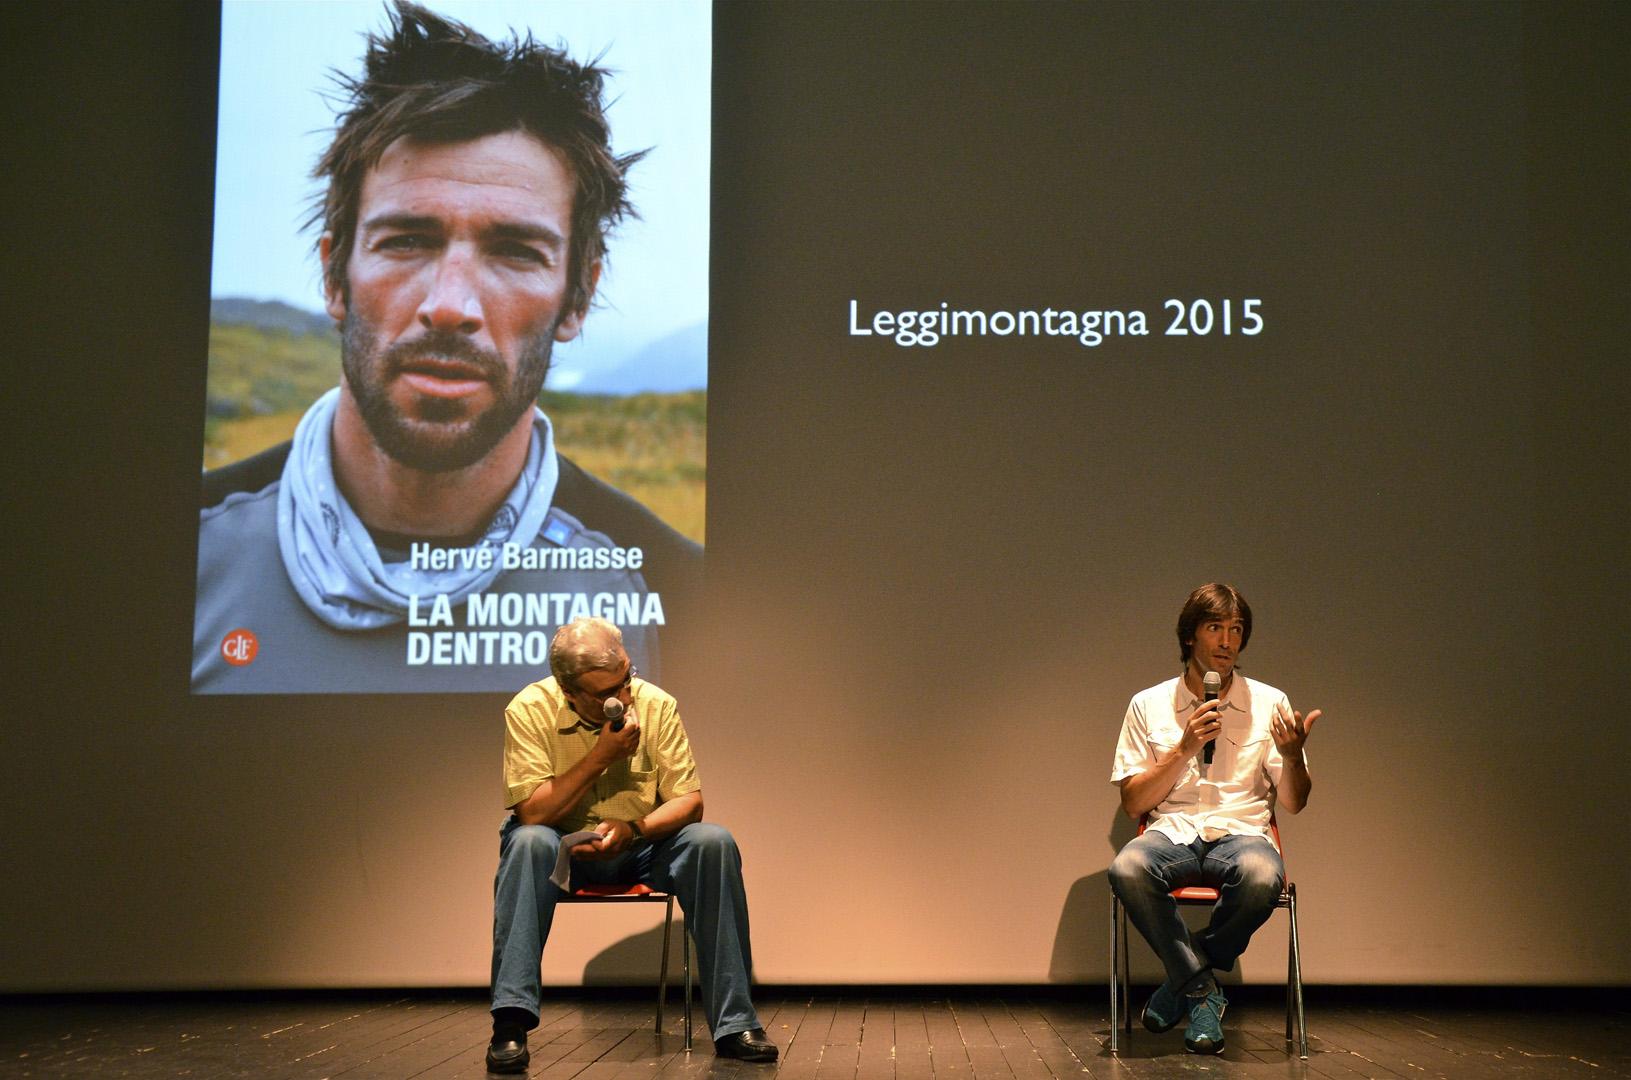 LEGGIMONTAGNA 2015 - HERVE BARMASSE (Ph Alberto Cella)